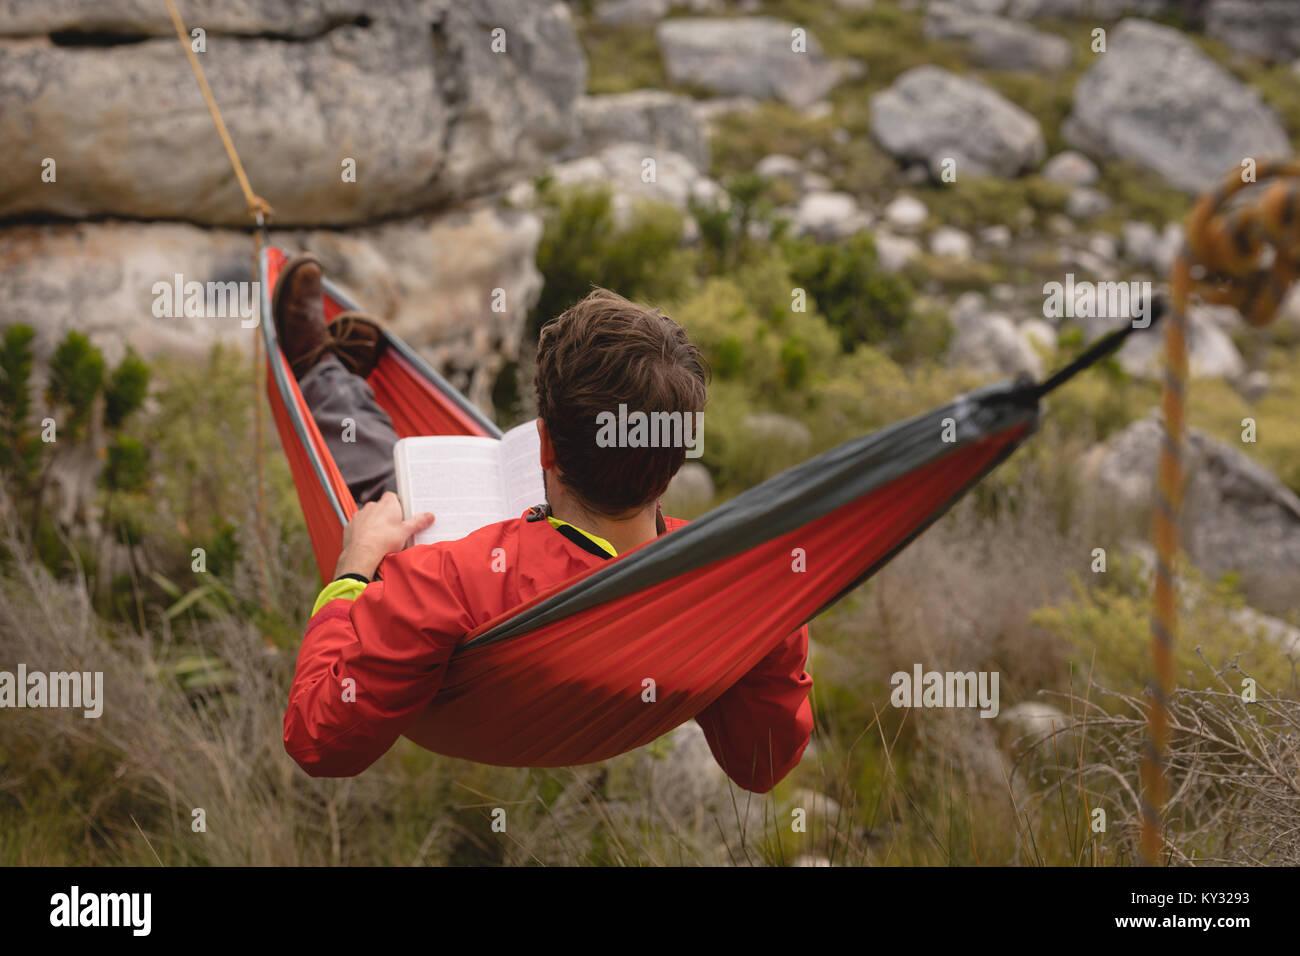 Hiker lying in hammock reading novel - Stock Image